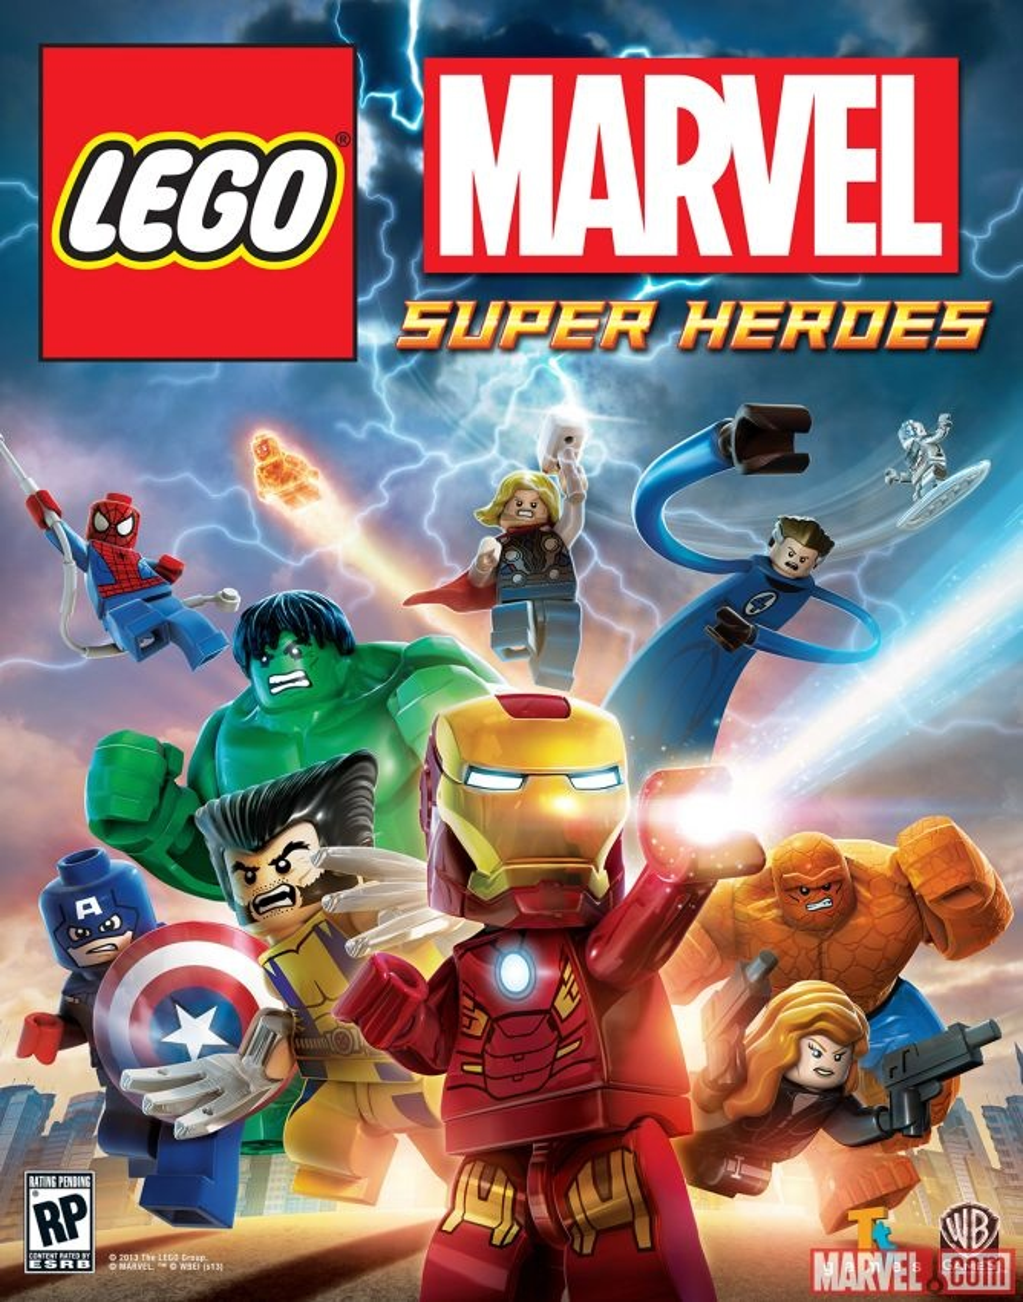 LEGO Marvel Superhéroes (videojuego)